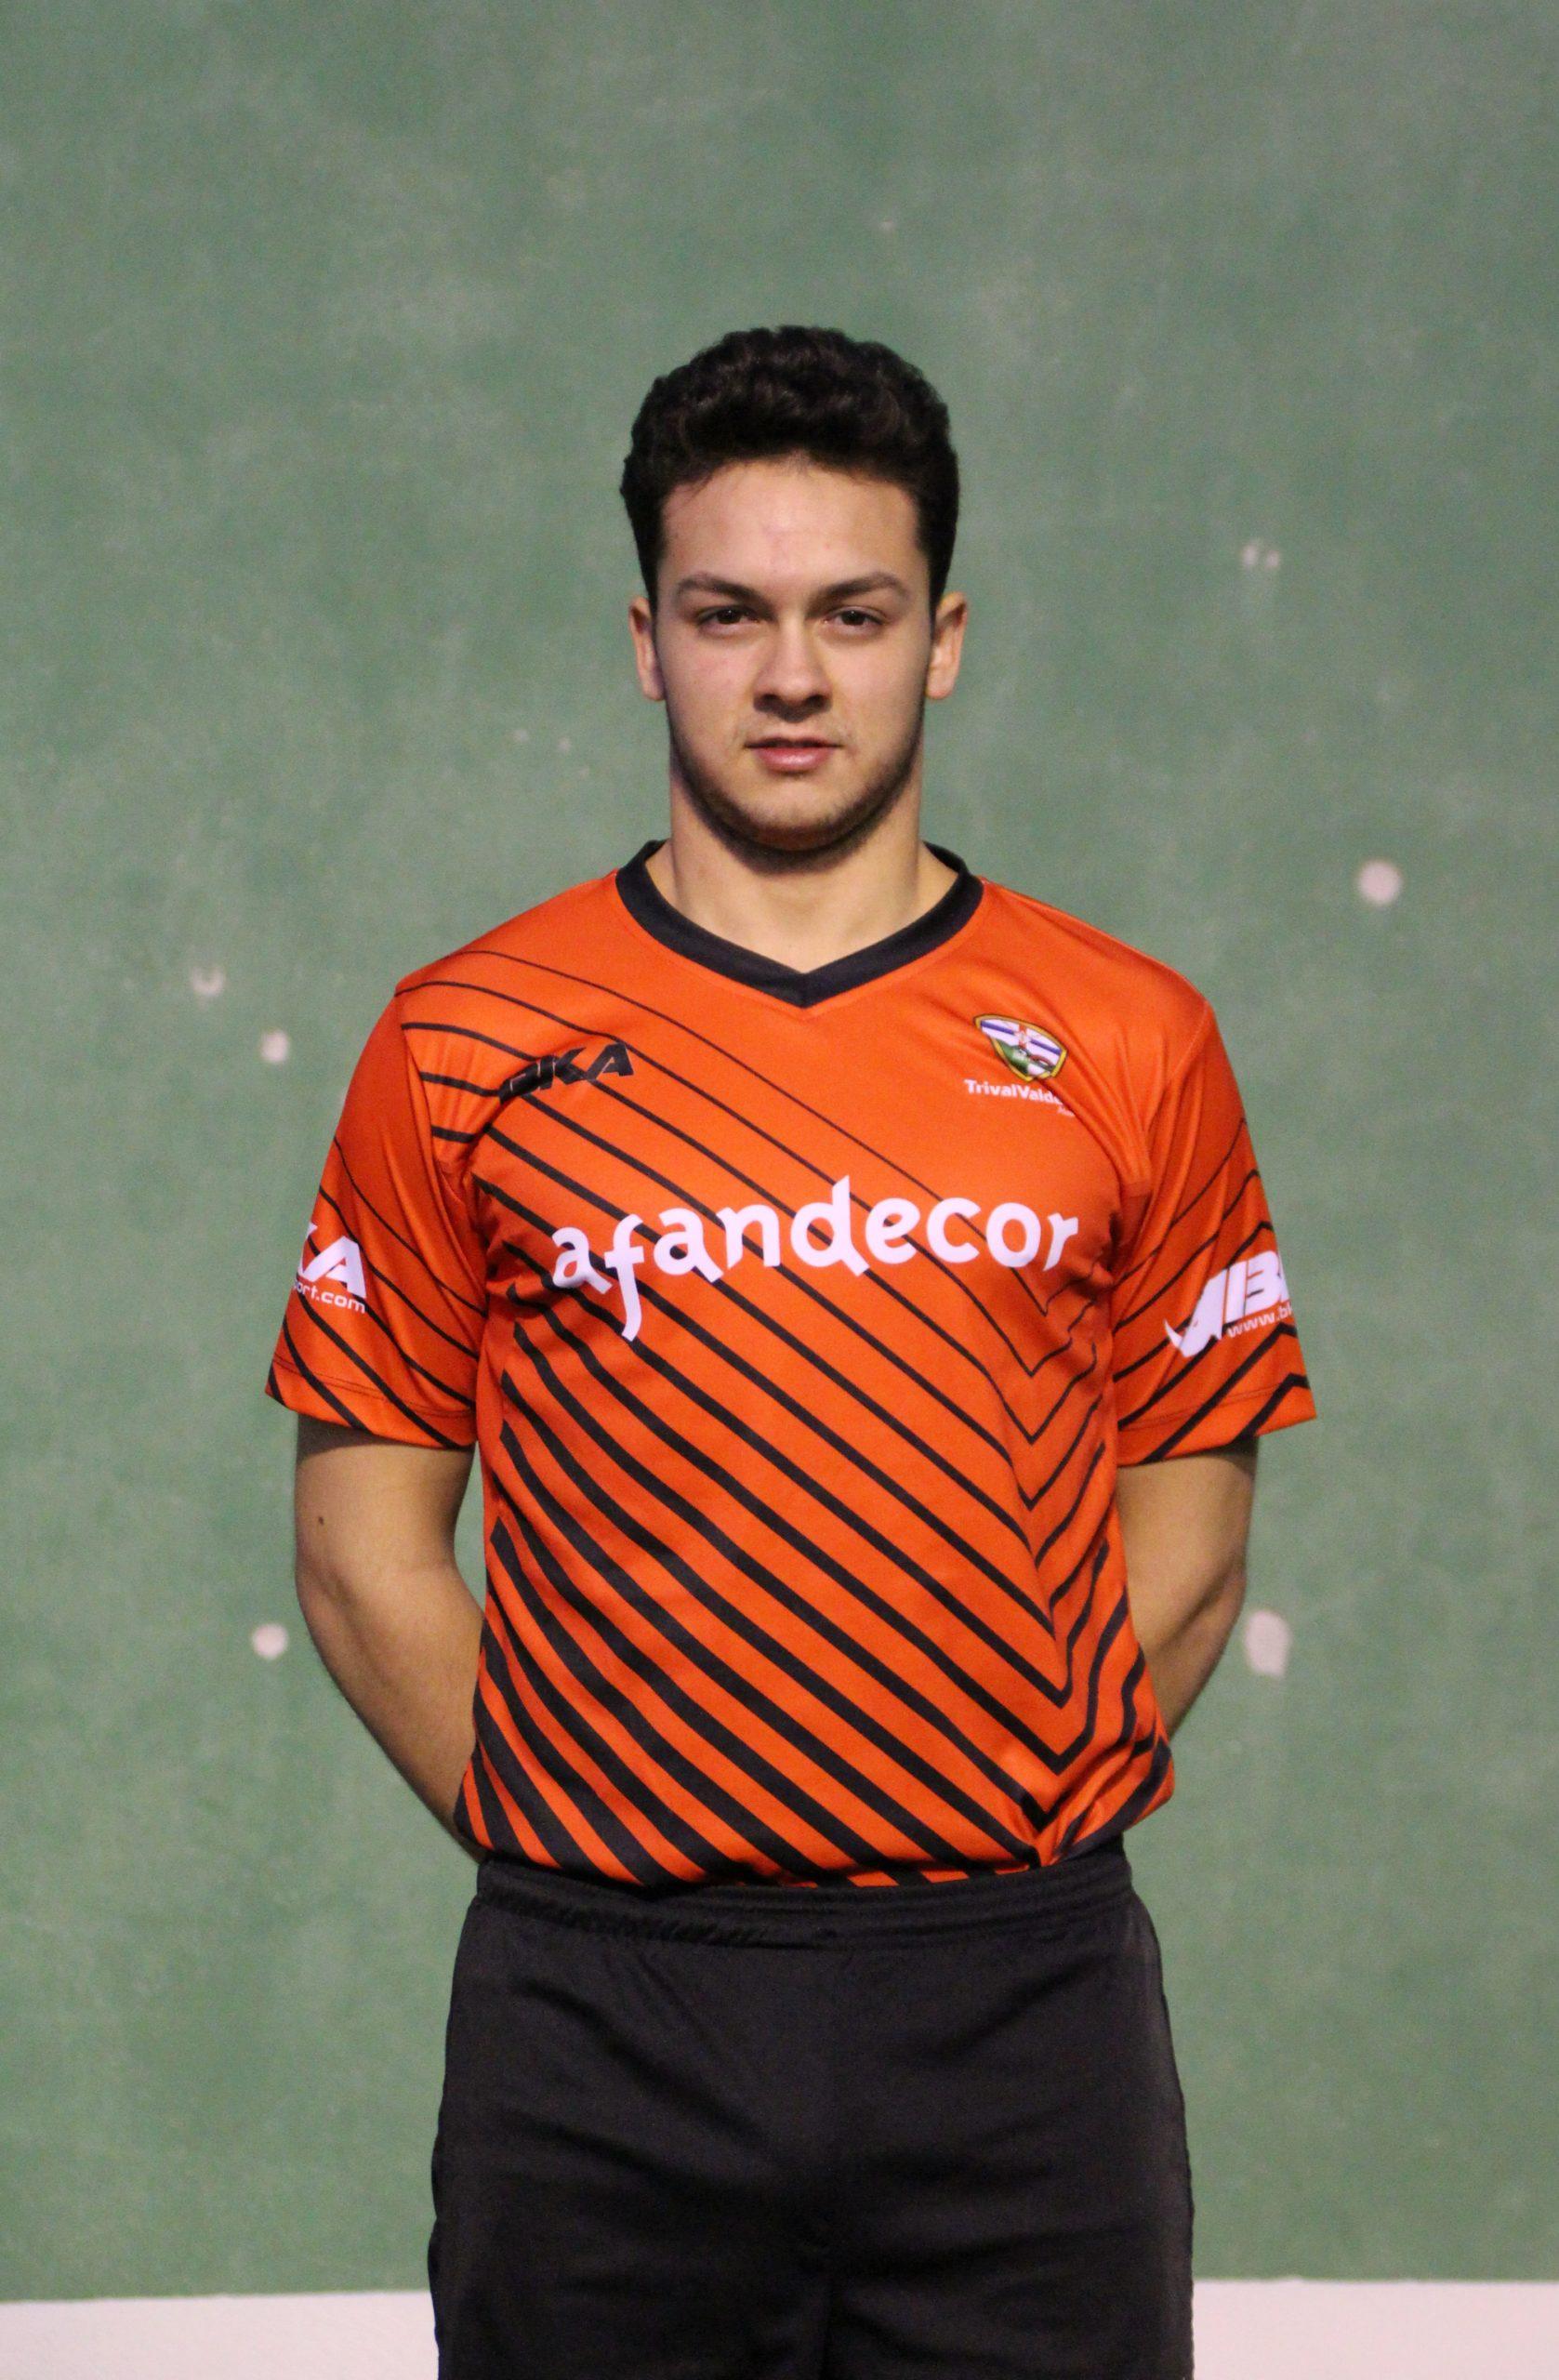 Gonzalo Lopo Sánchez